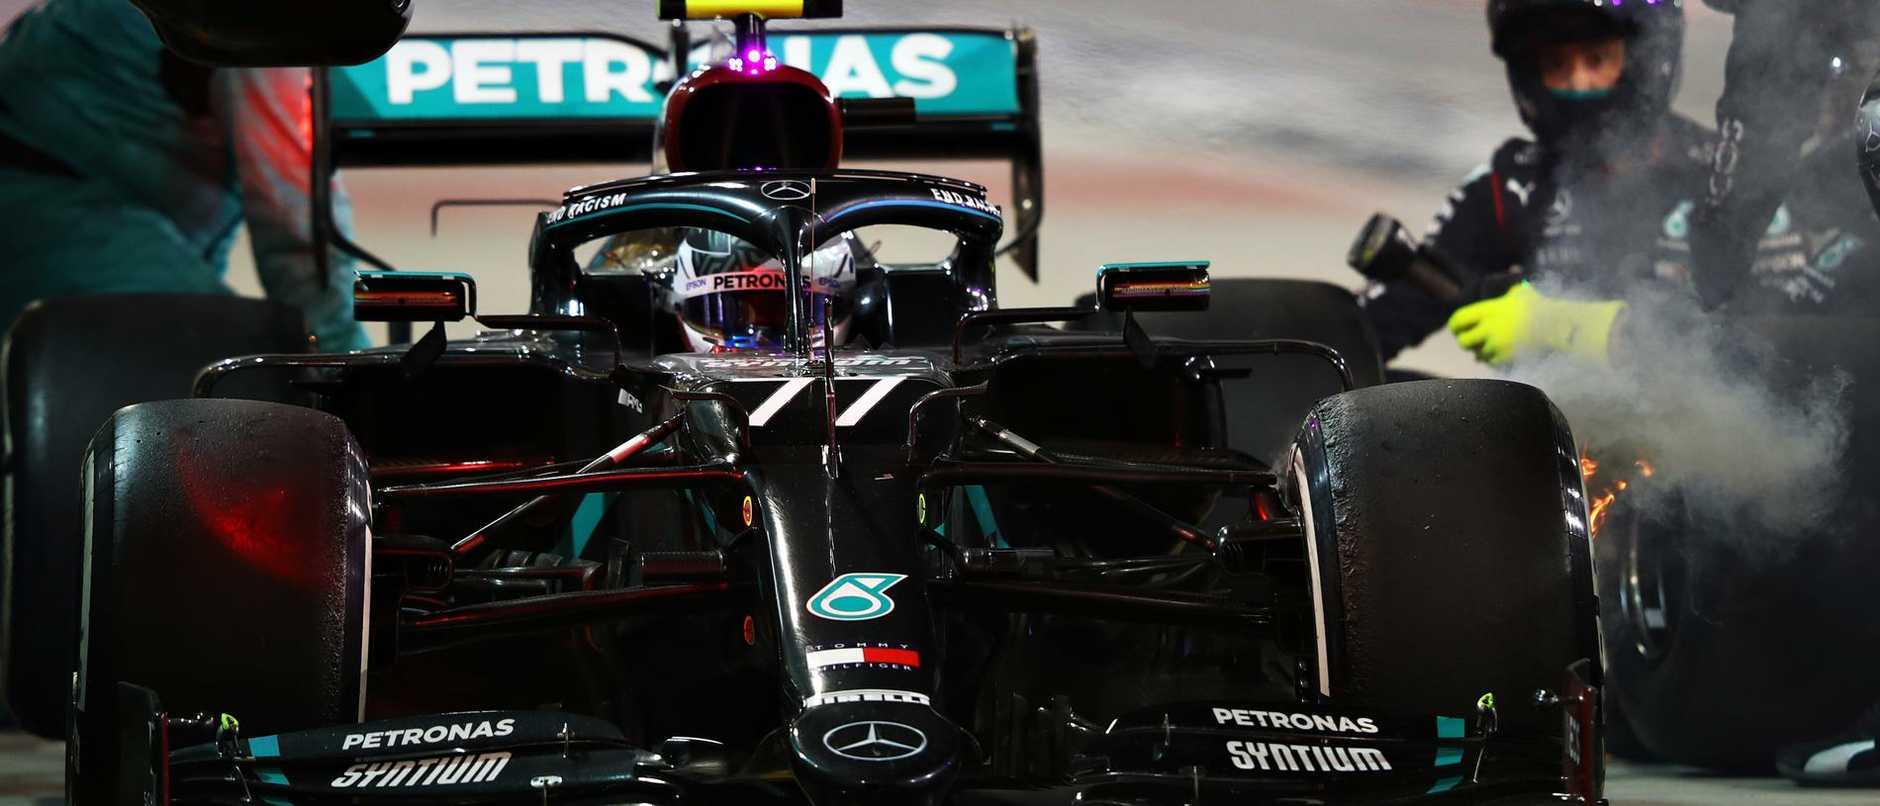 Horrific Mercedes mix-up causes heartbreak in dramatic Sakhir Grand Prix